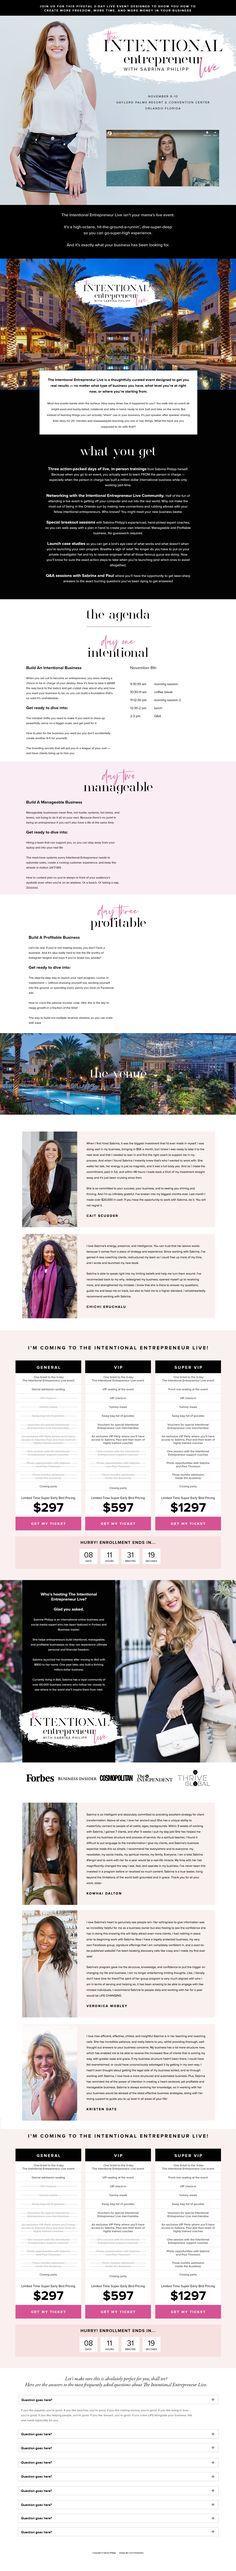 www.sabrinaphilipp.com/intentional-entrepreneur-live Entrepreneur, Live Events, Personal Branding, Page Design, Branding Design, Corporate Design, Identity Branding, Self Branding, Brand Design